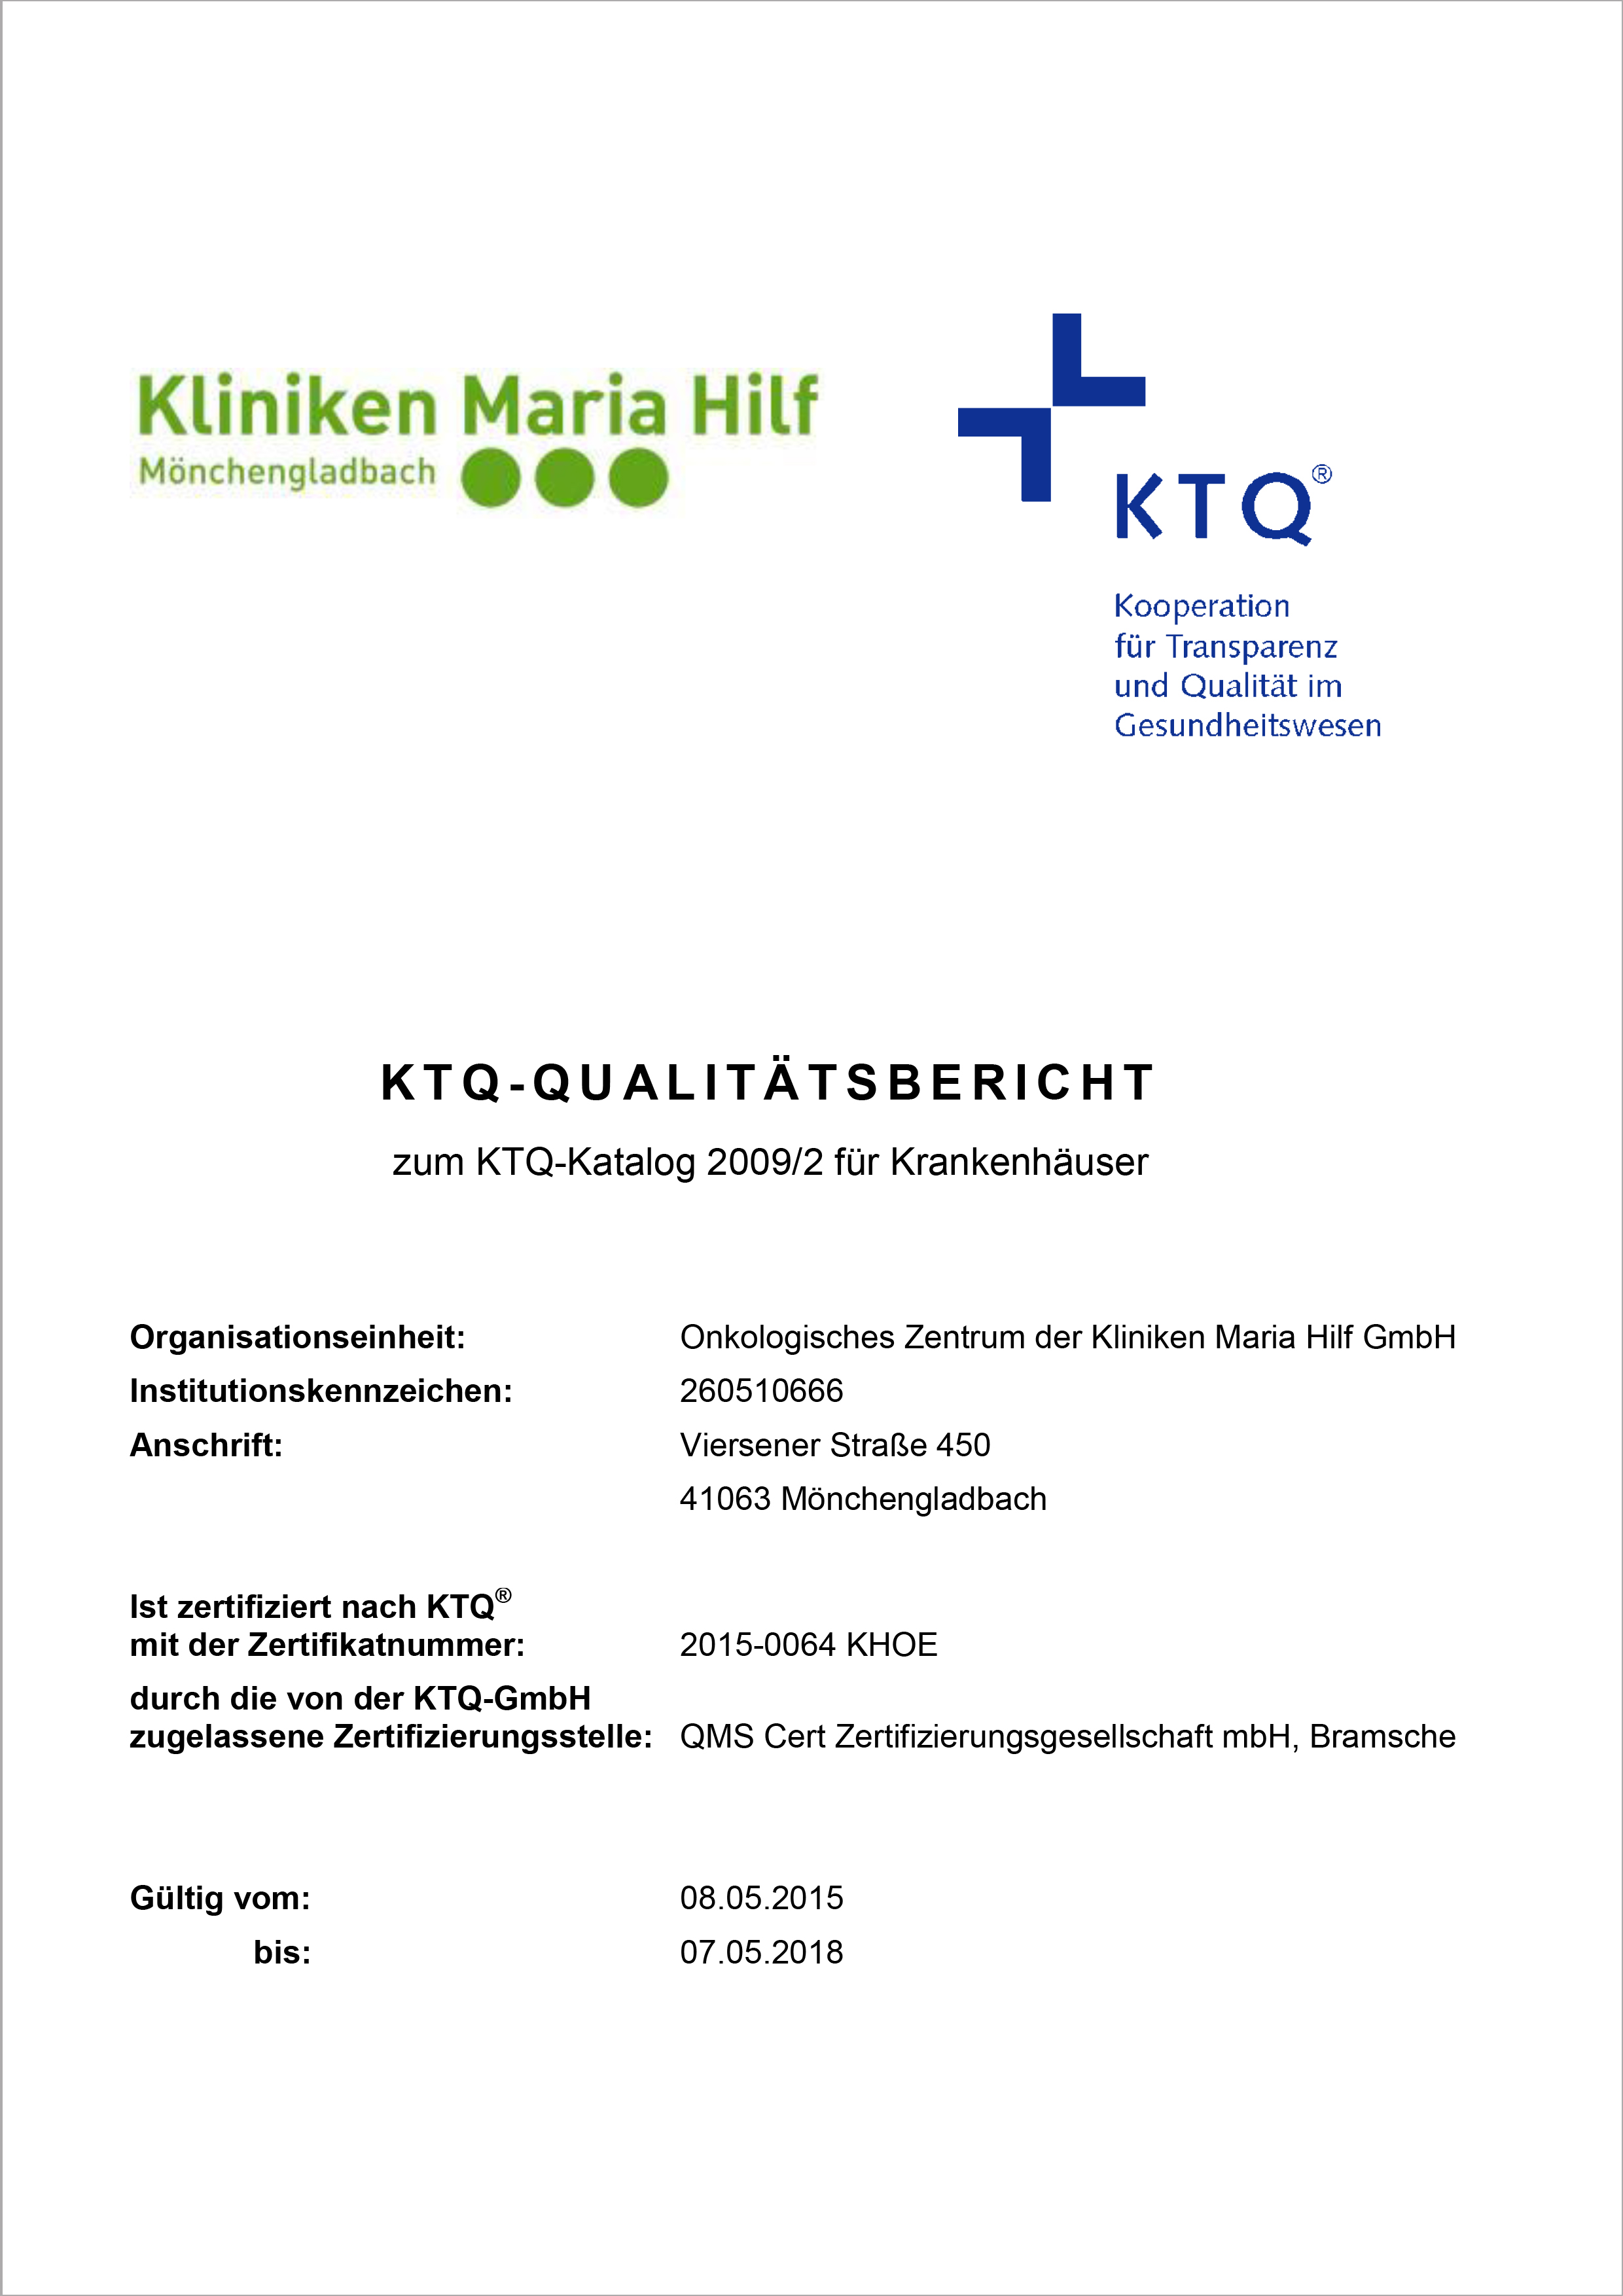 KTQ-Bericht 2015